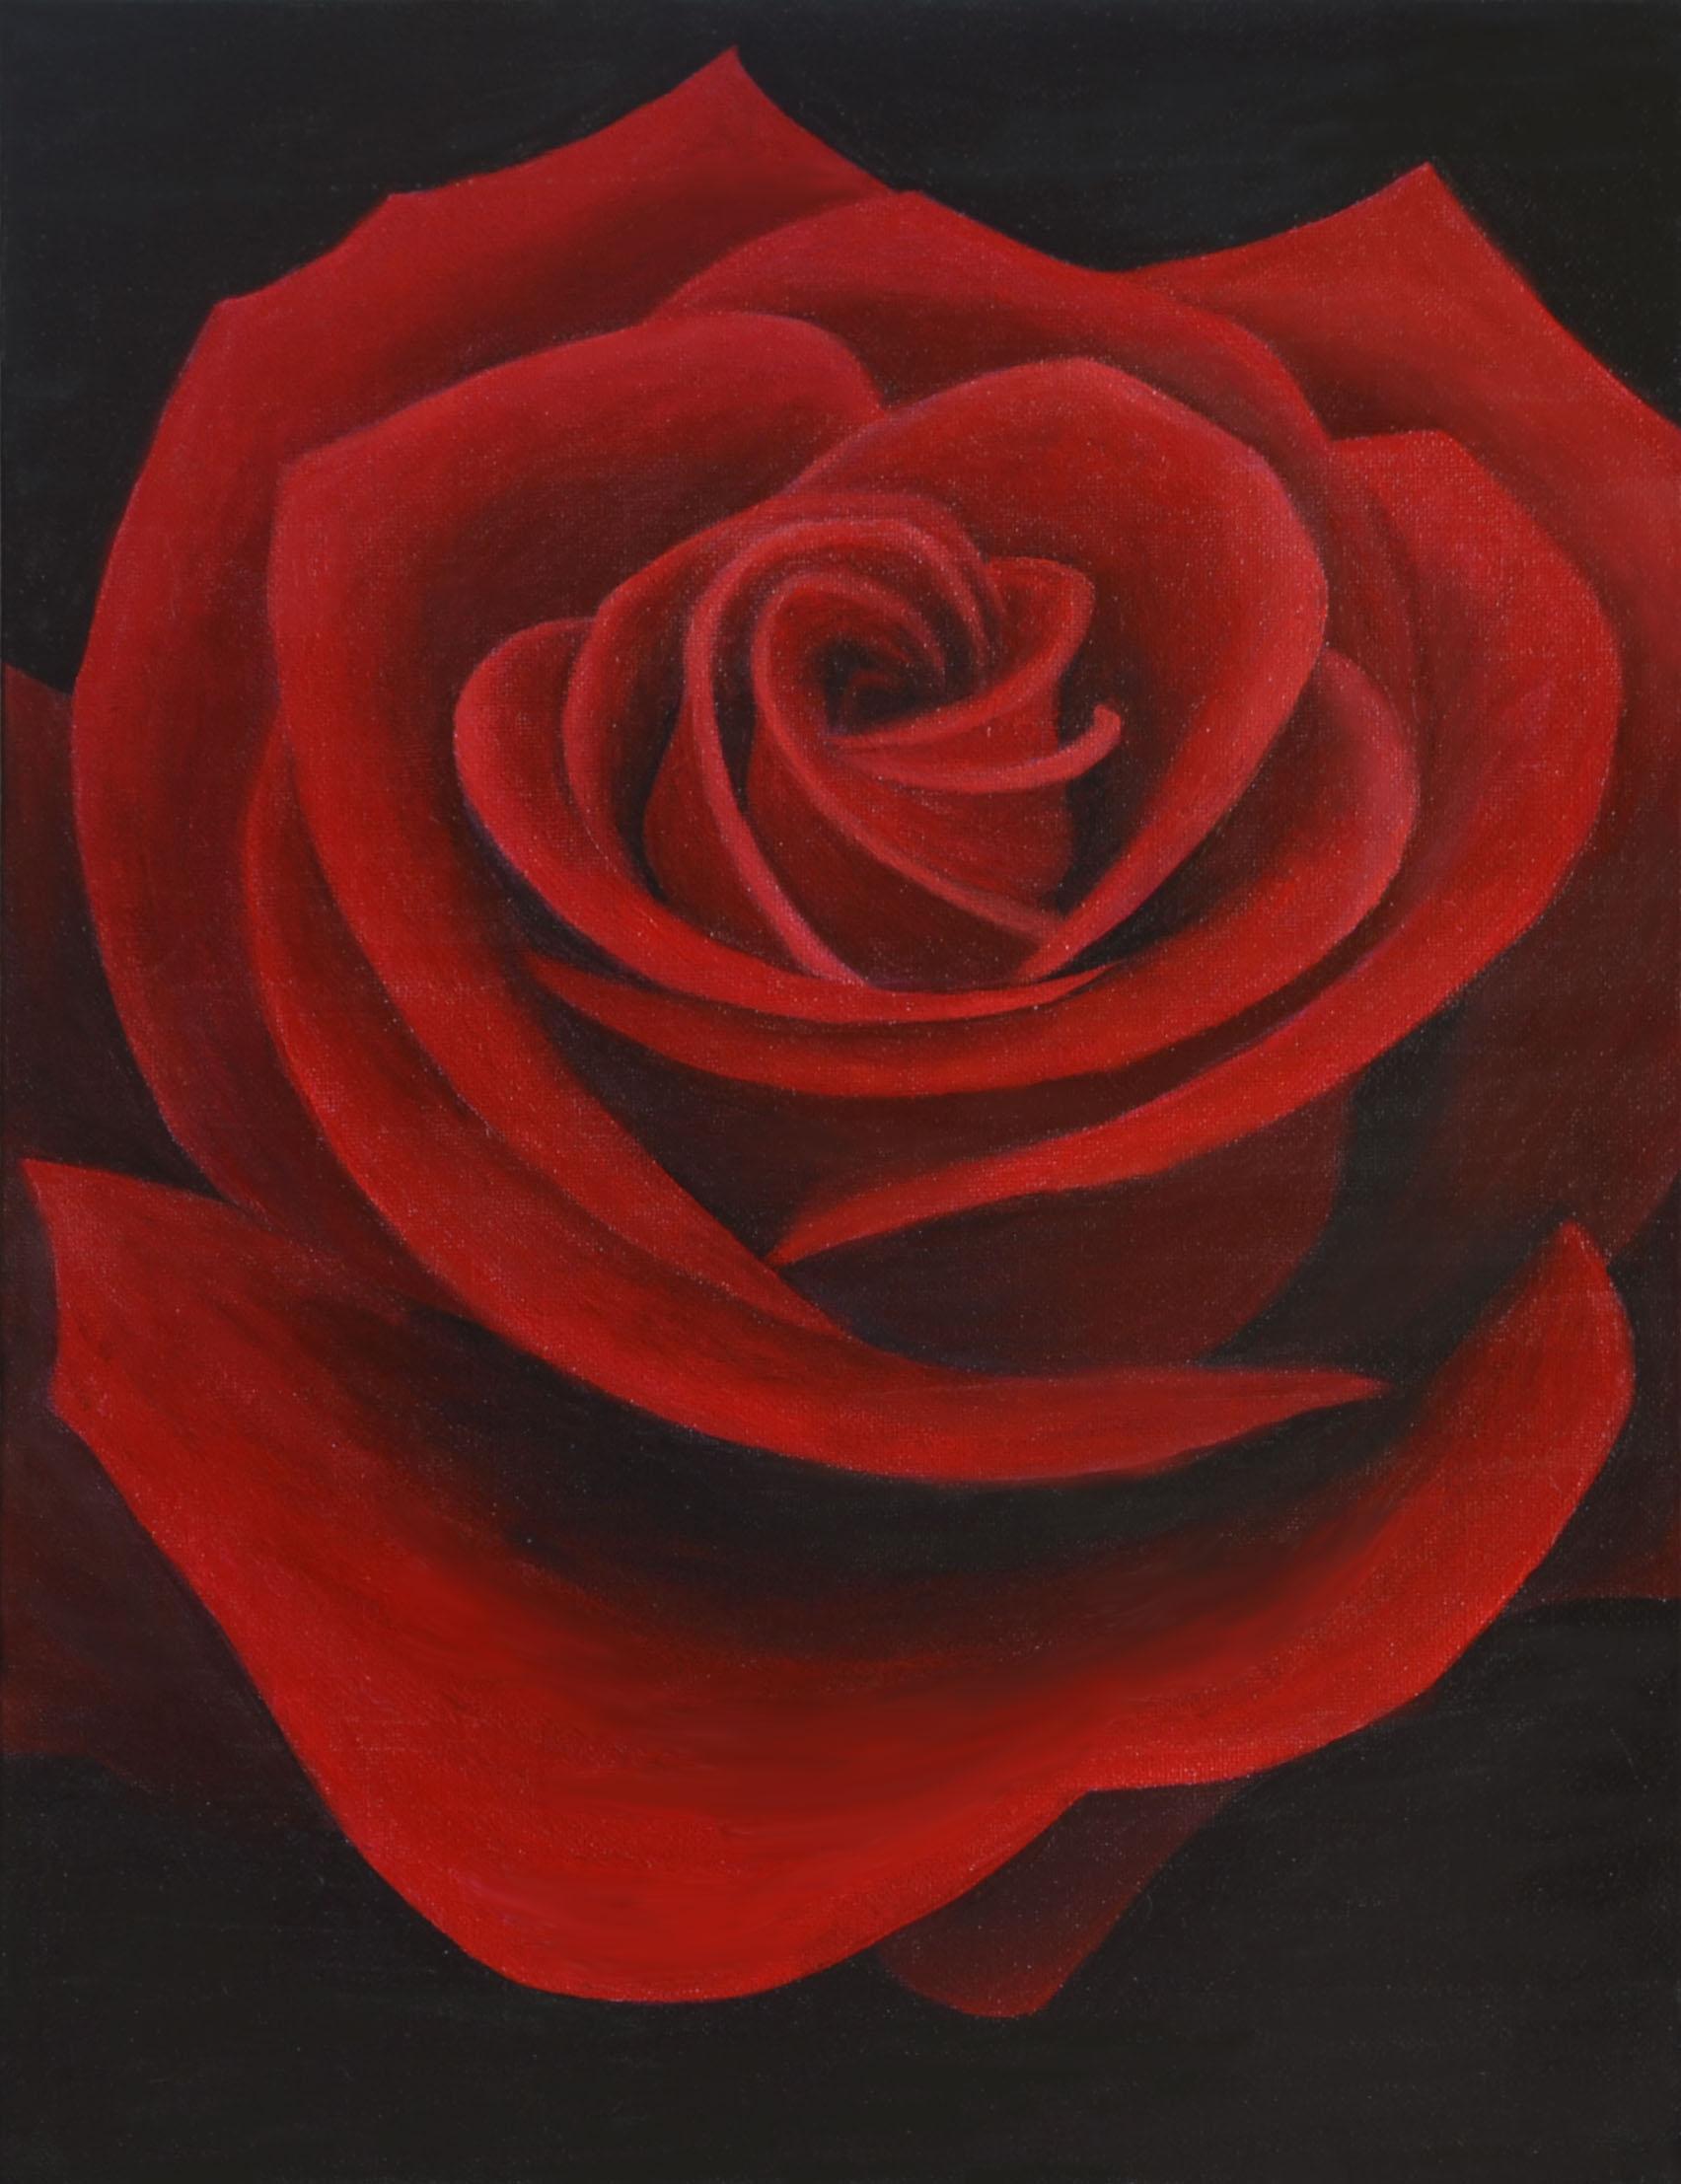 Rose painting photo